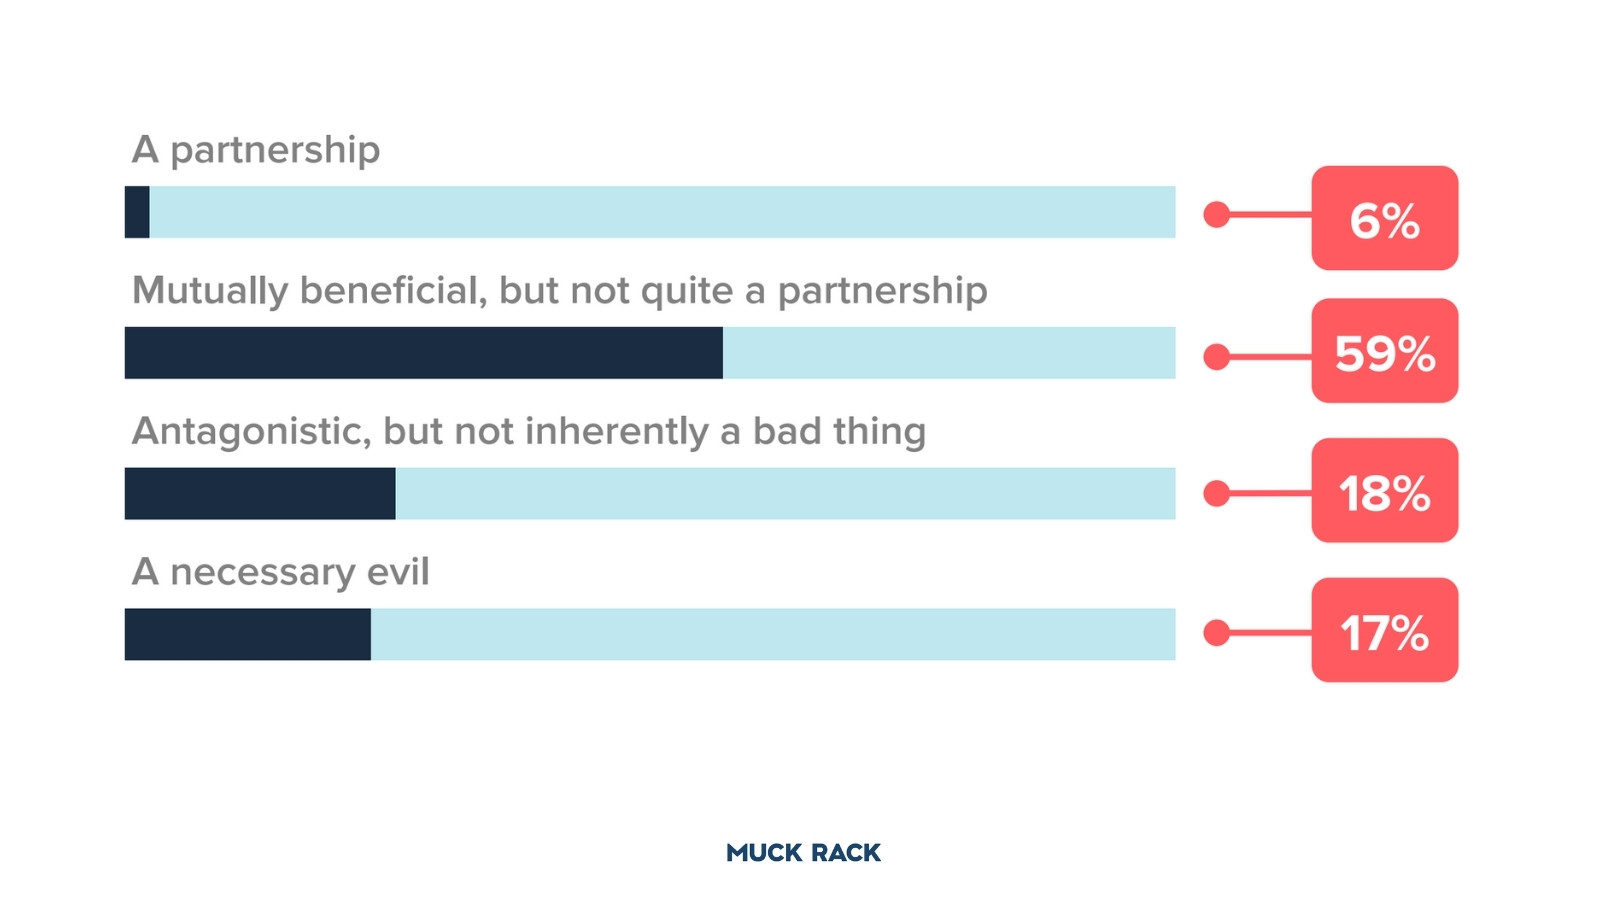 How do journalists view PR